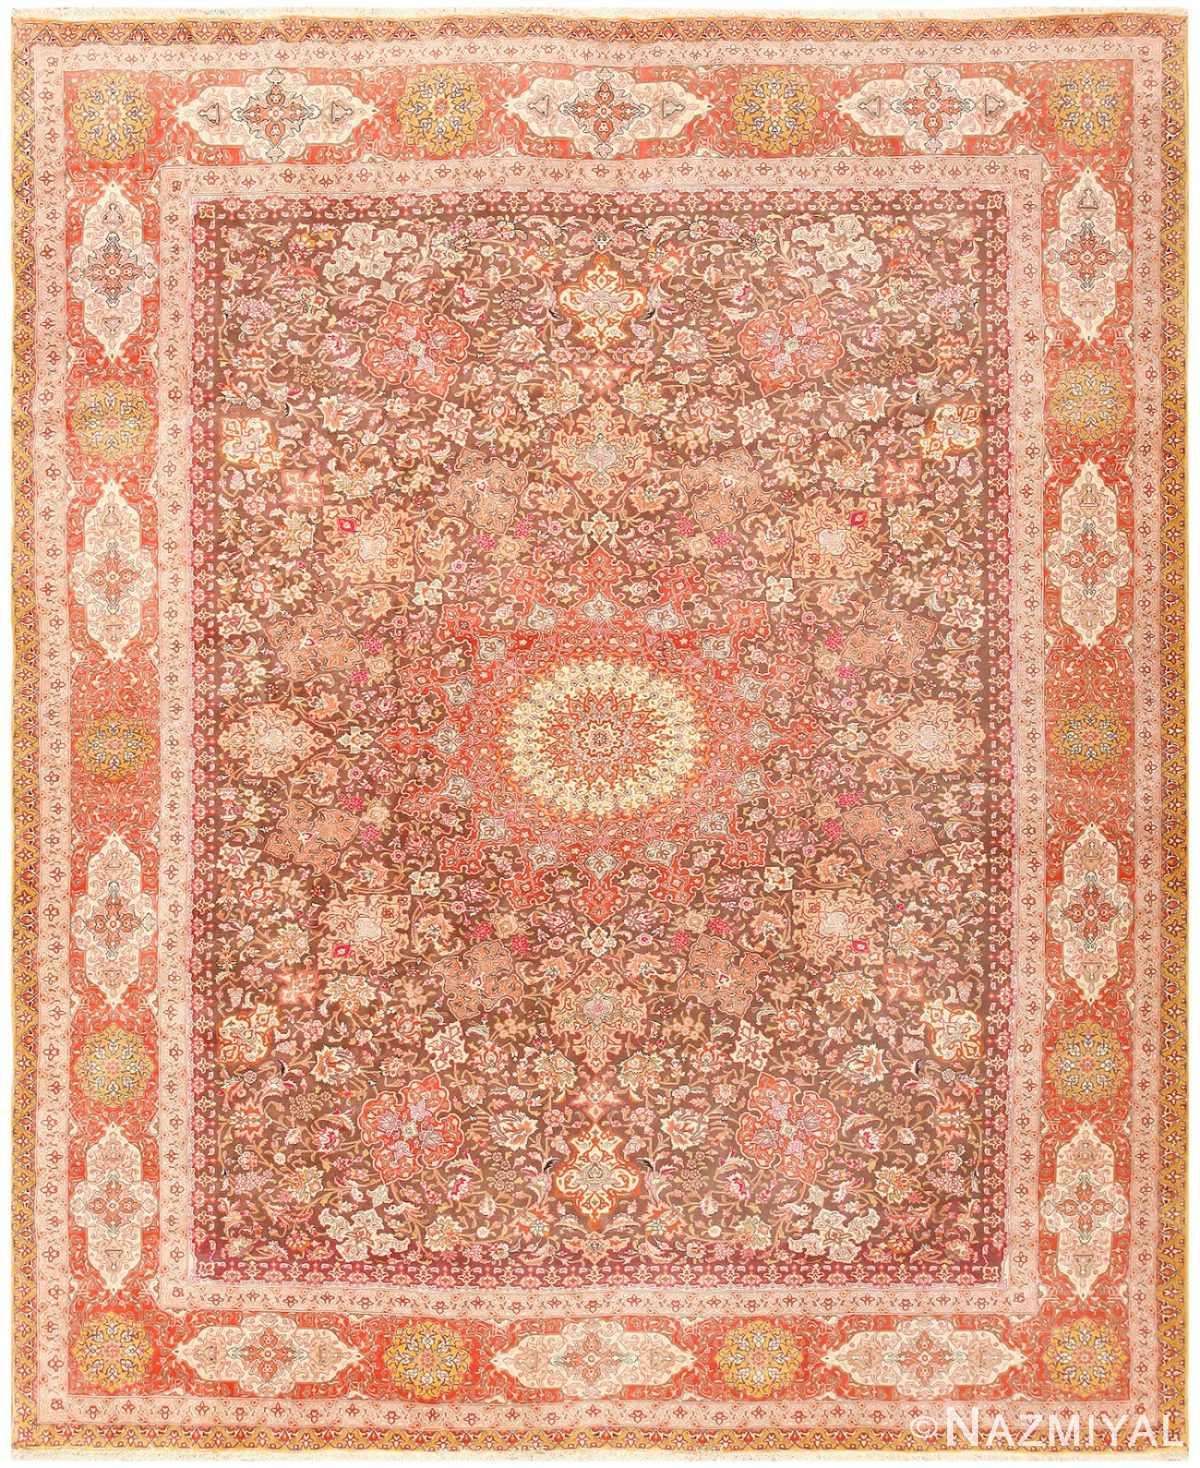 Silk and Wool Room Sized Tabriz Persian Carpet 50251 Nazmiyal